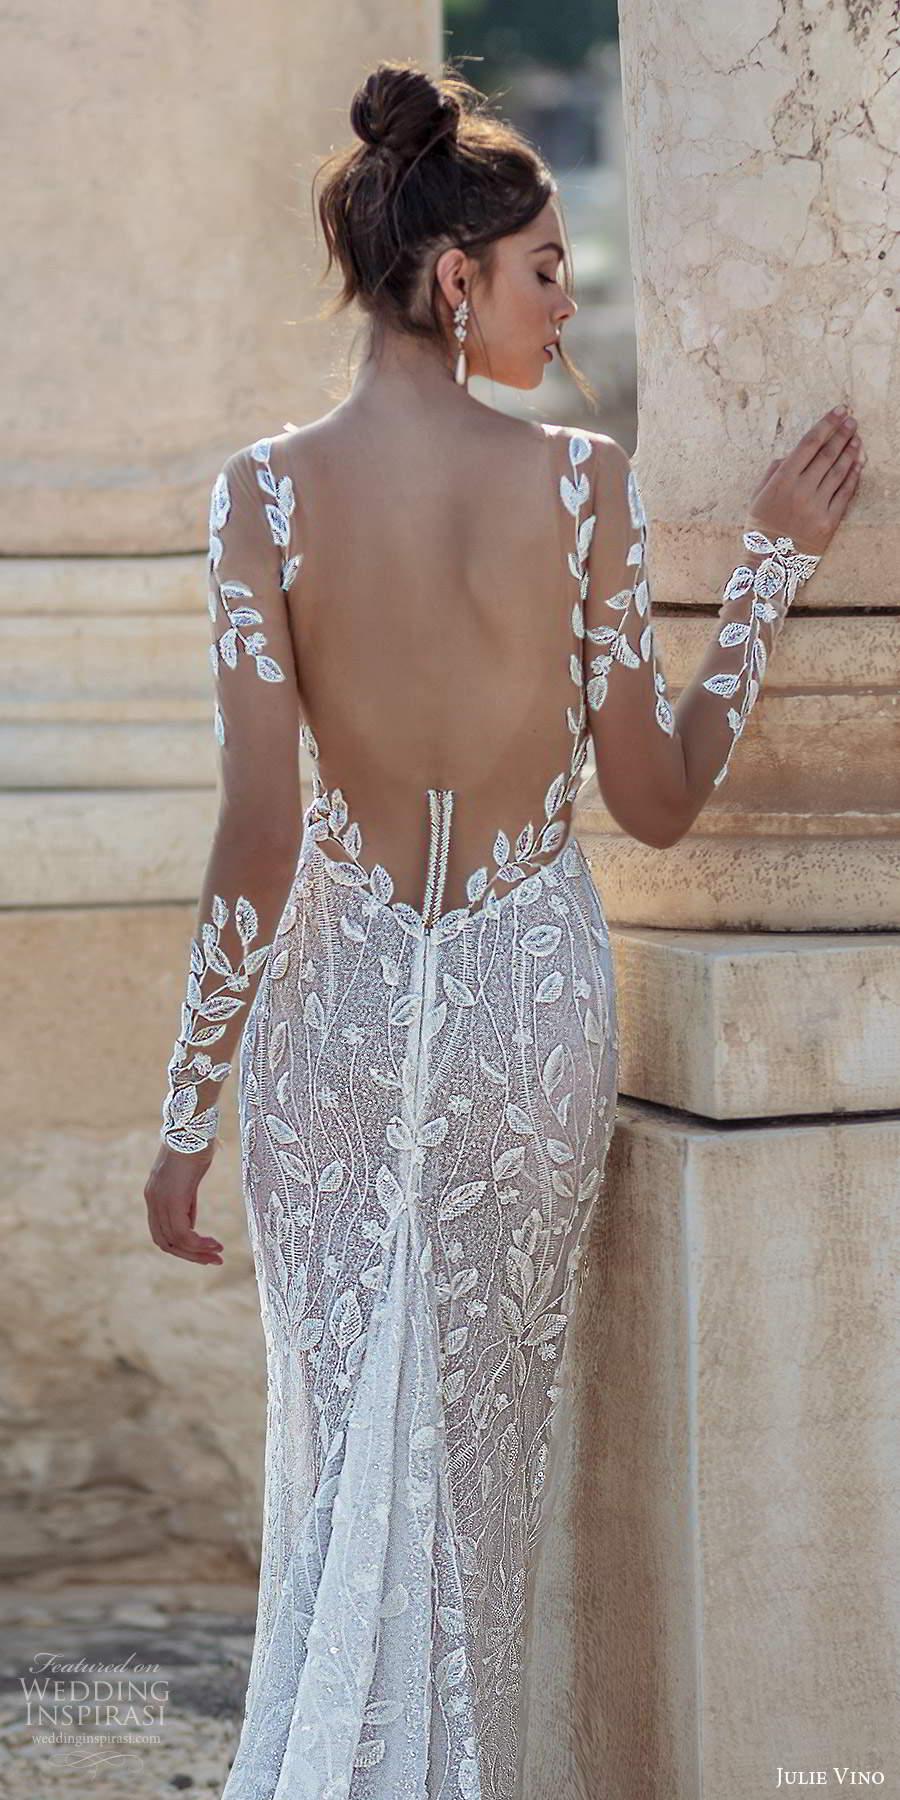 julie vino 2021 bridal illusion long sleeves plunging sweetheart neckline fully embellished sheath wedding dress chapel train (3) zbv